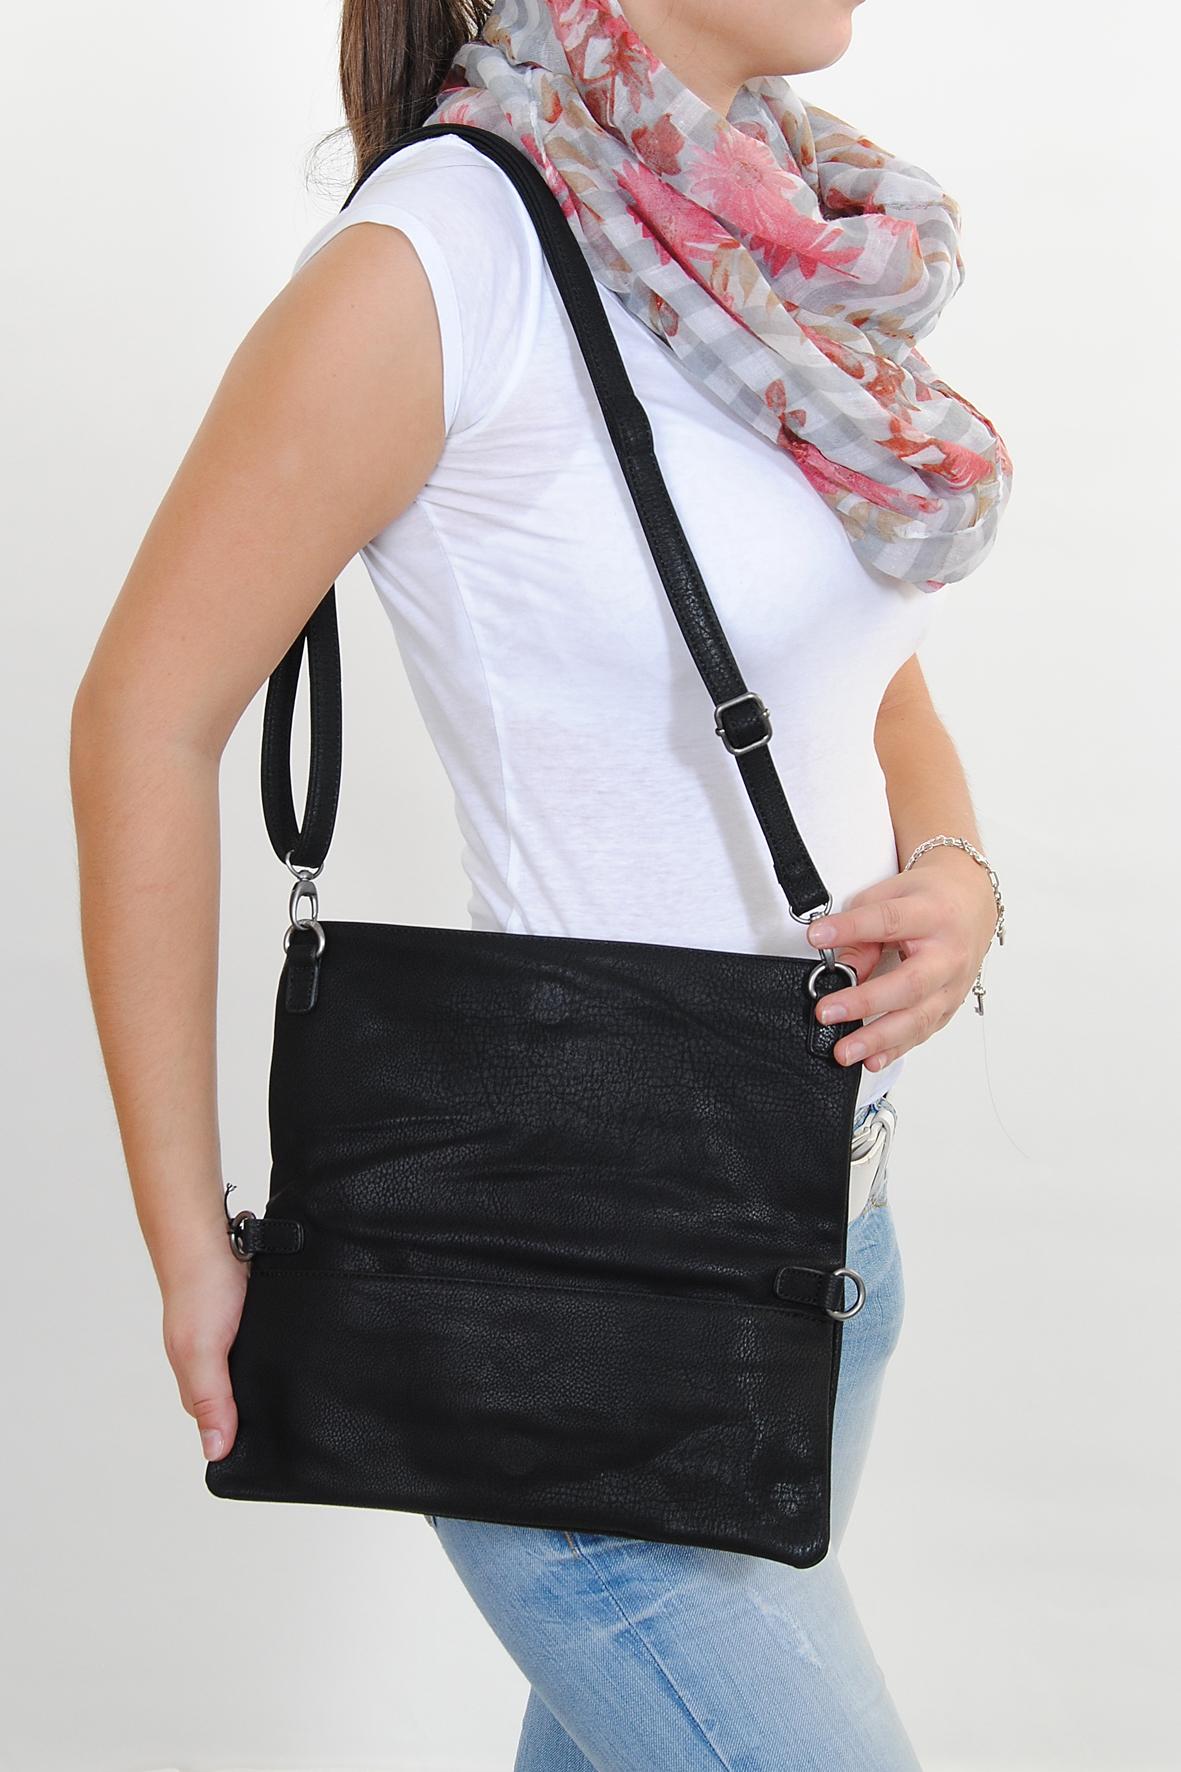 fritzi aus preu en damen handtasche umh ngetasche clutch ronja black berlin ebay. Black Bedroom Furniture Sets. Home Design Ideas